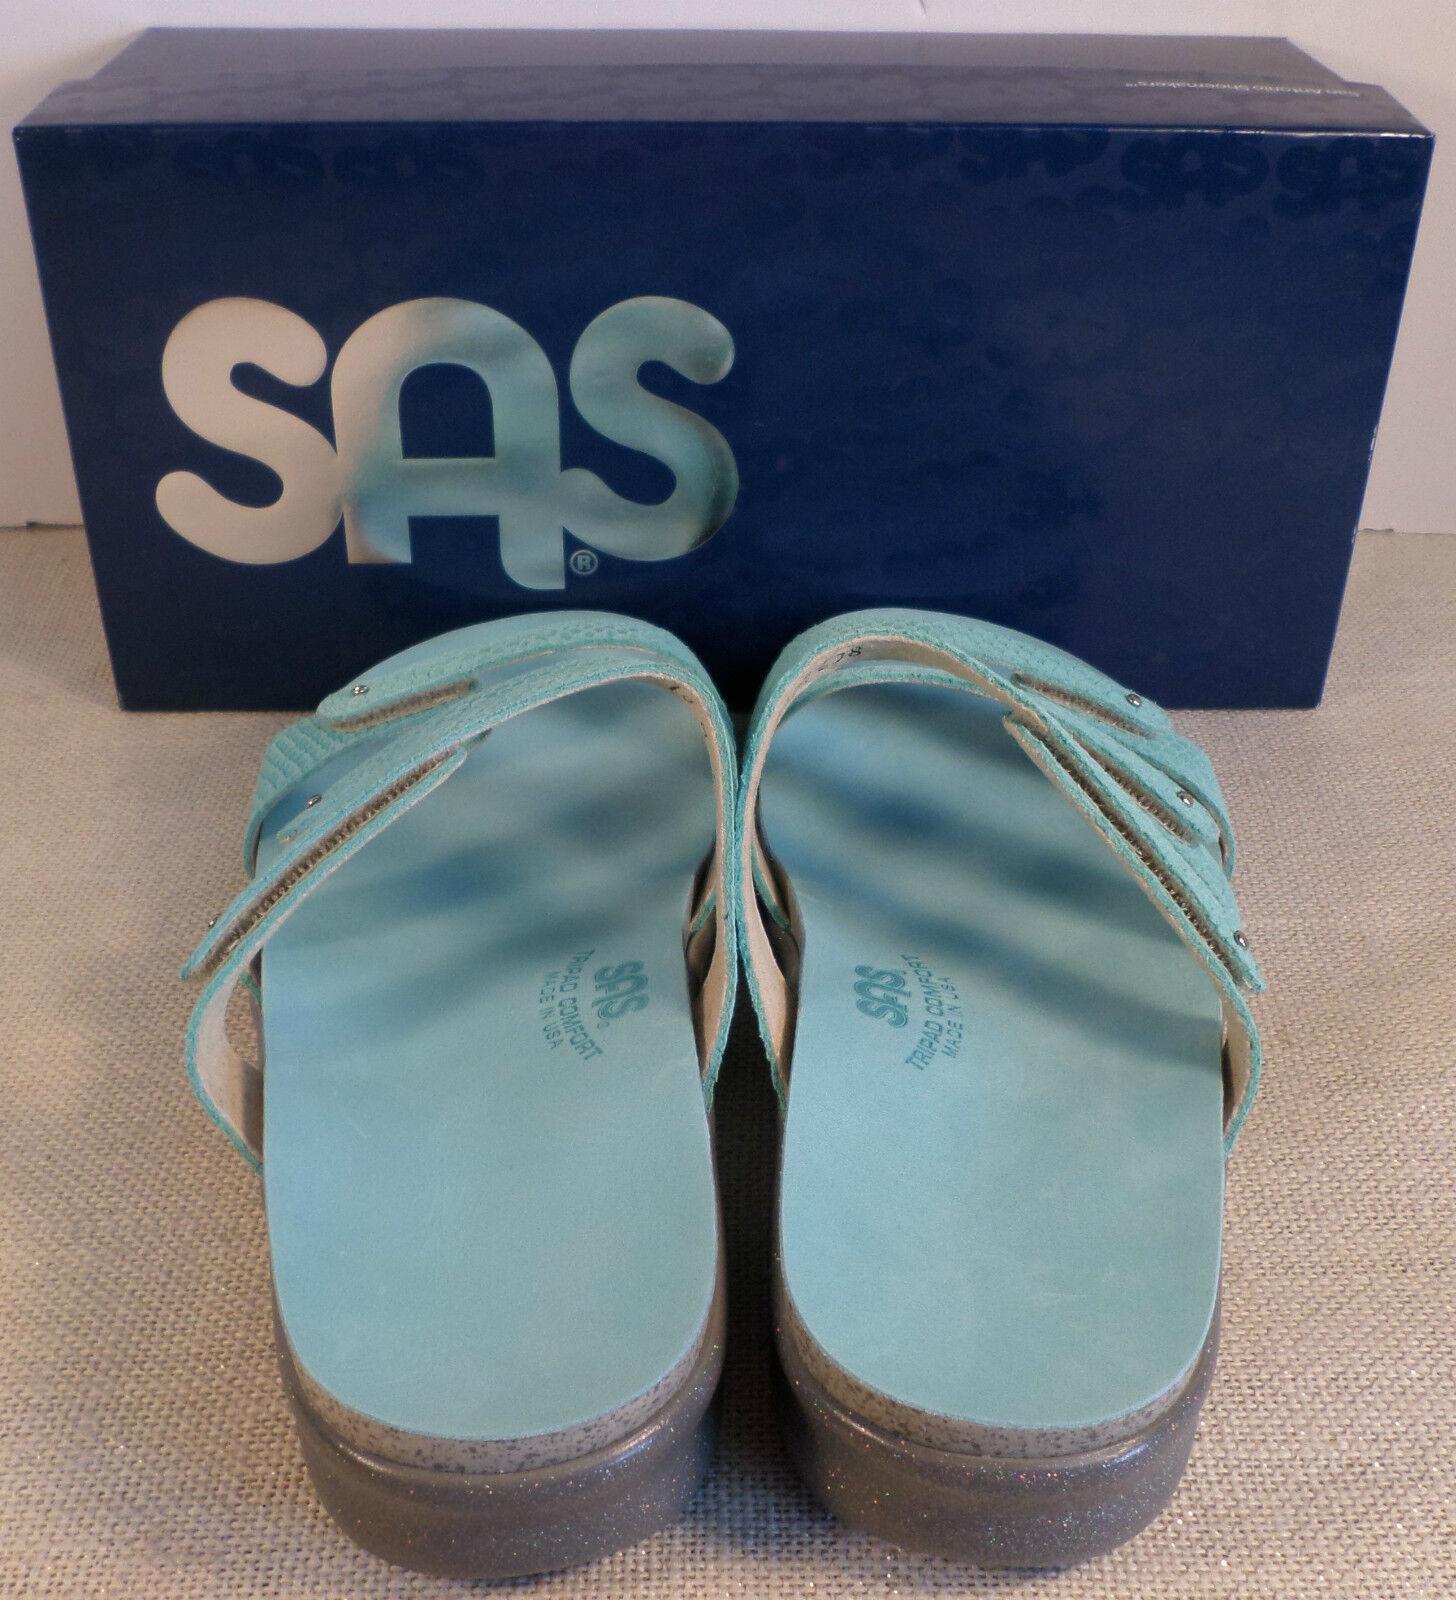 SAS FLIP ISKIA SKY WOMEN'S Blau FLIP SAS FLOP SANDALS NEW IN BOX 358e8b